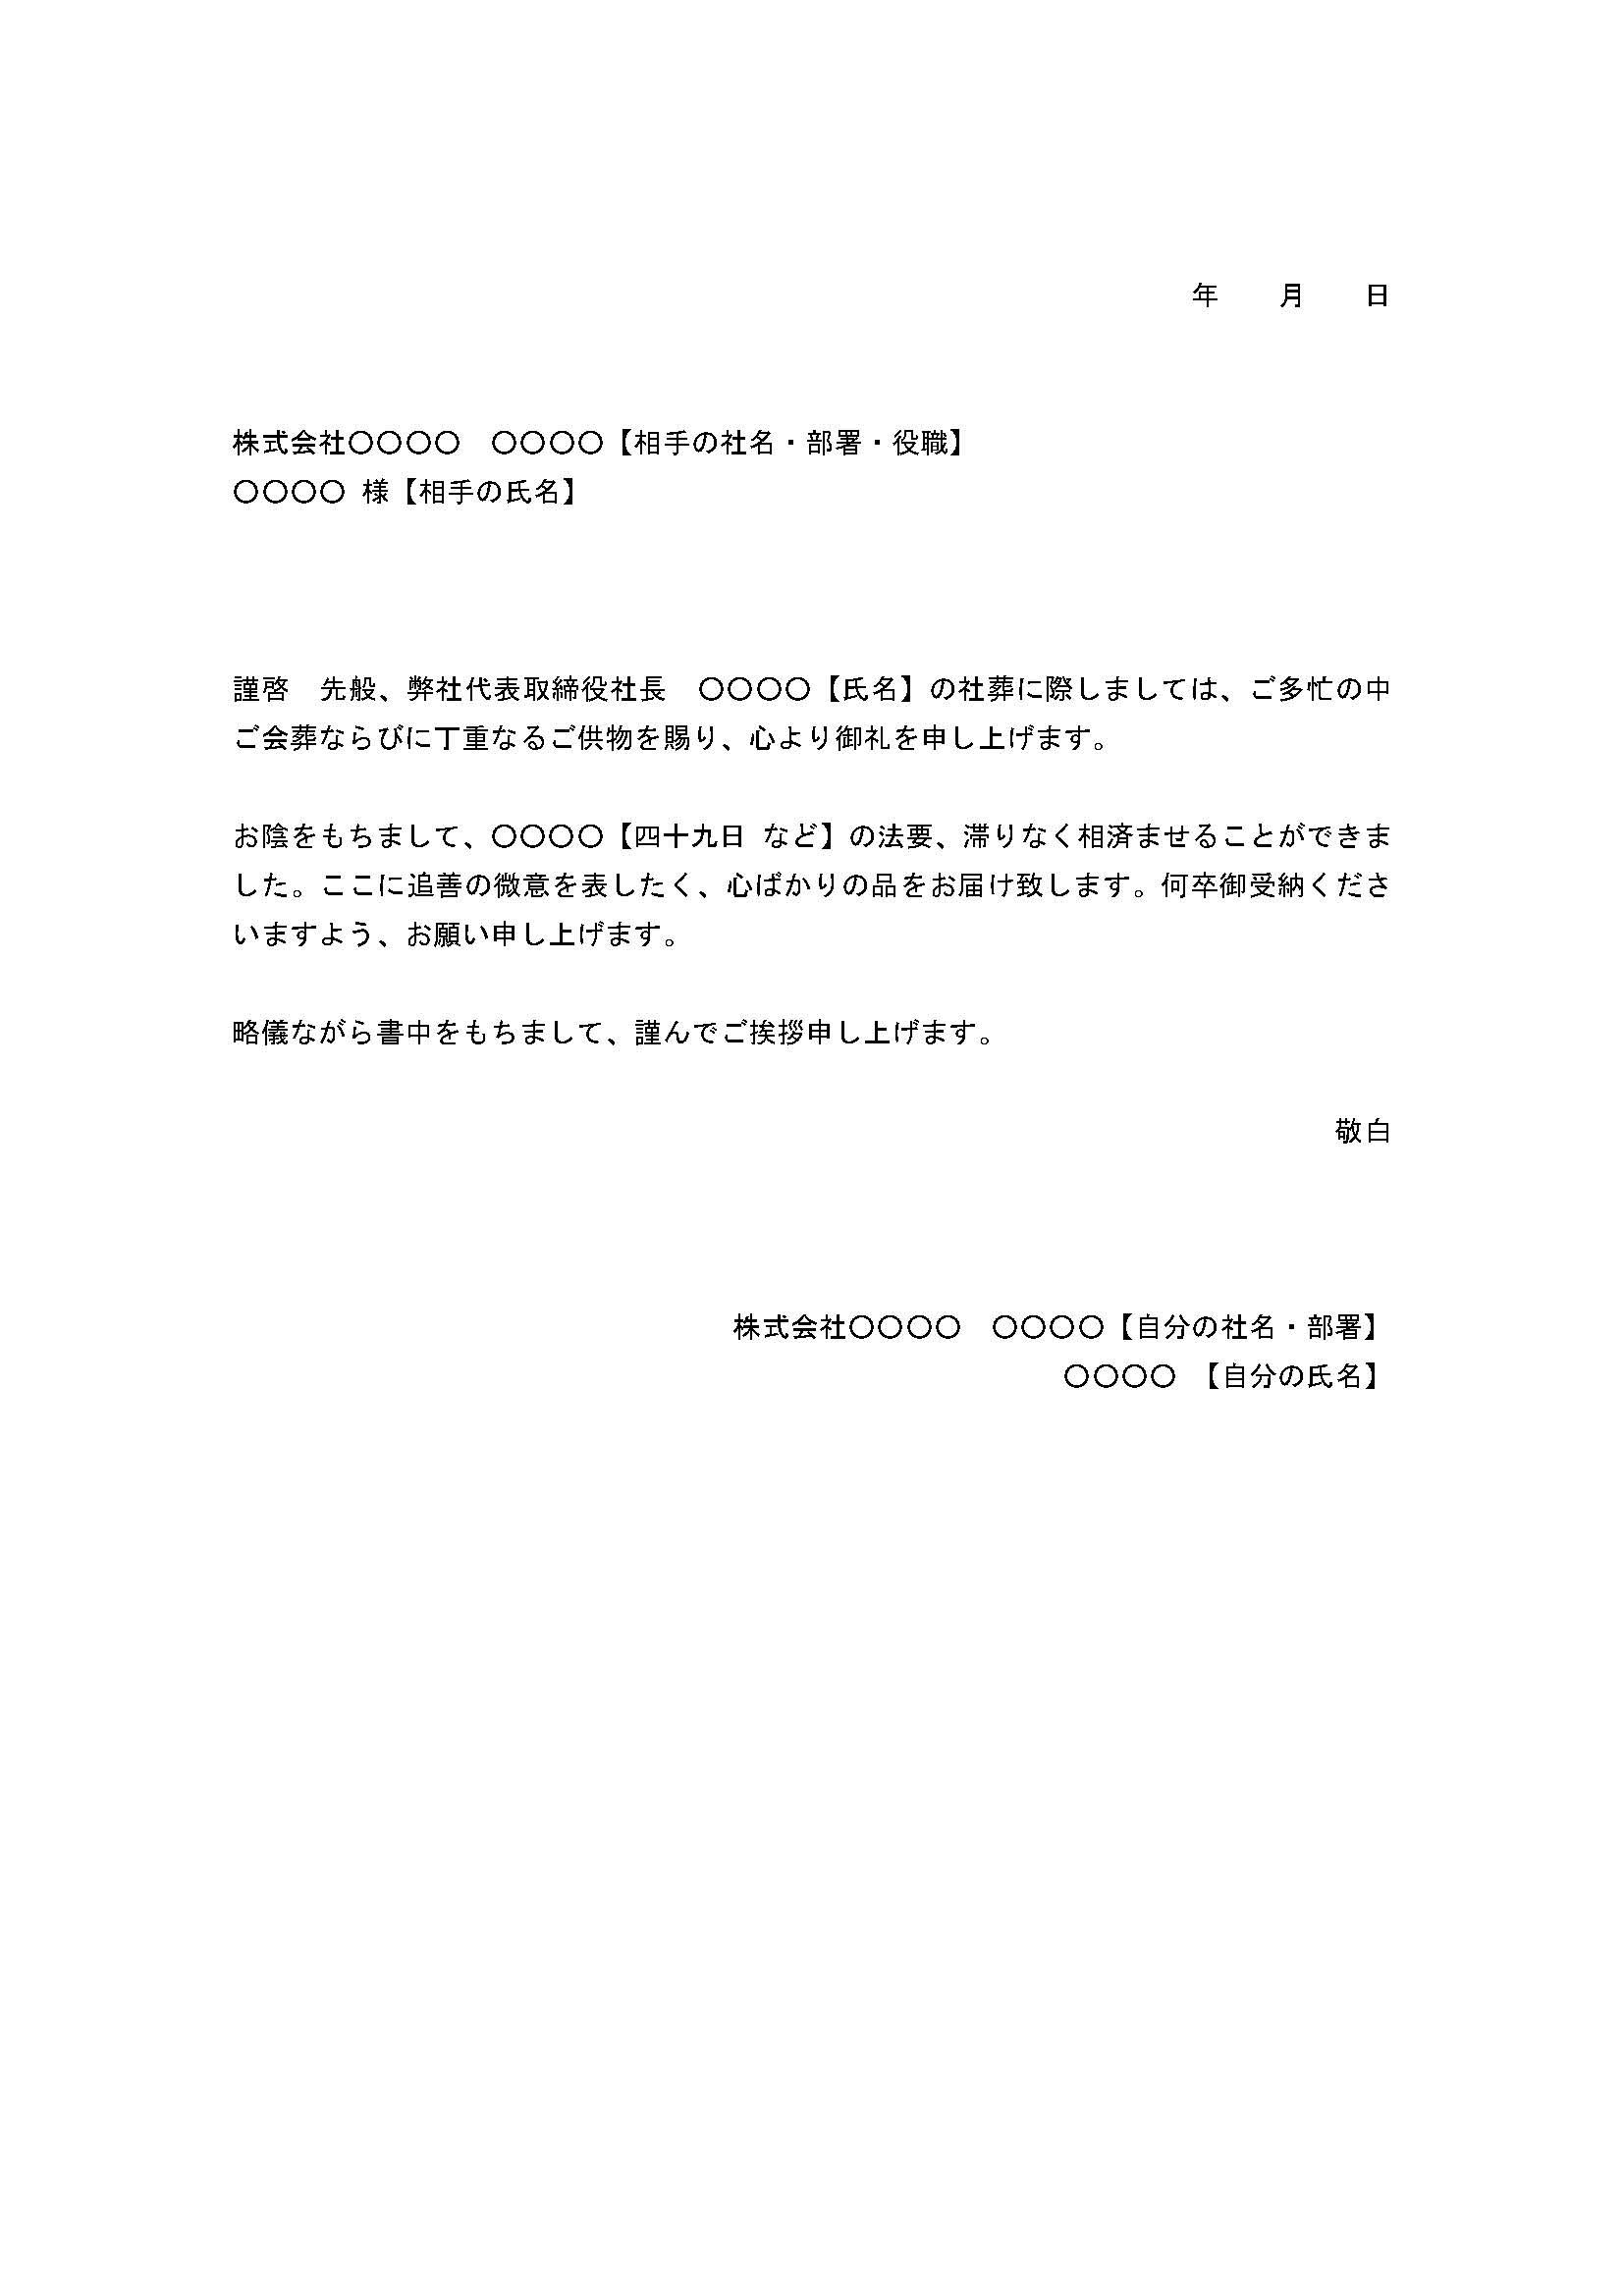 お礼状(法要)